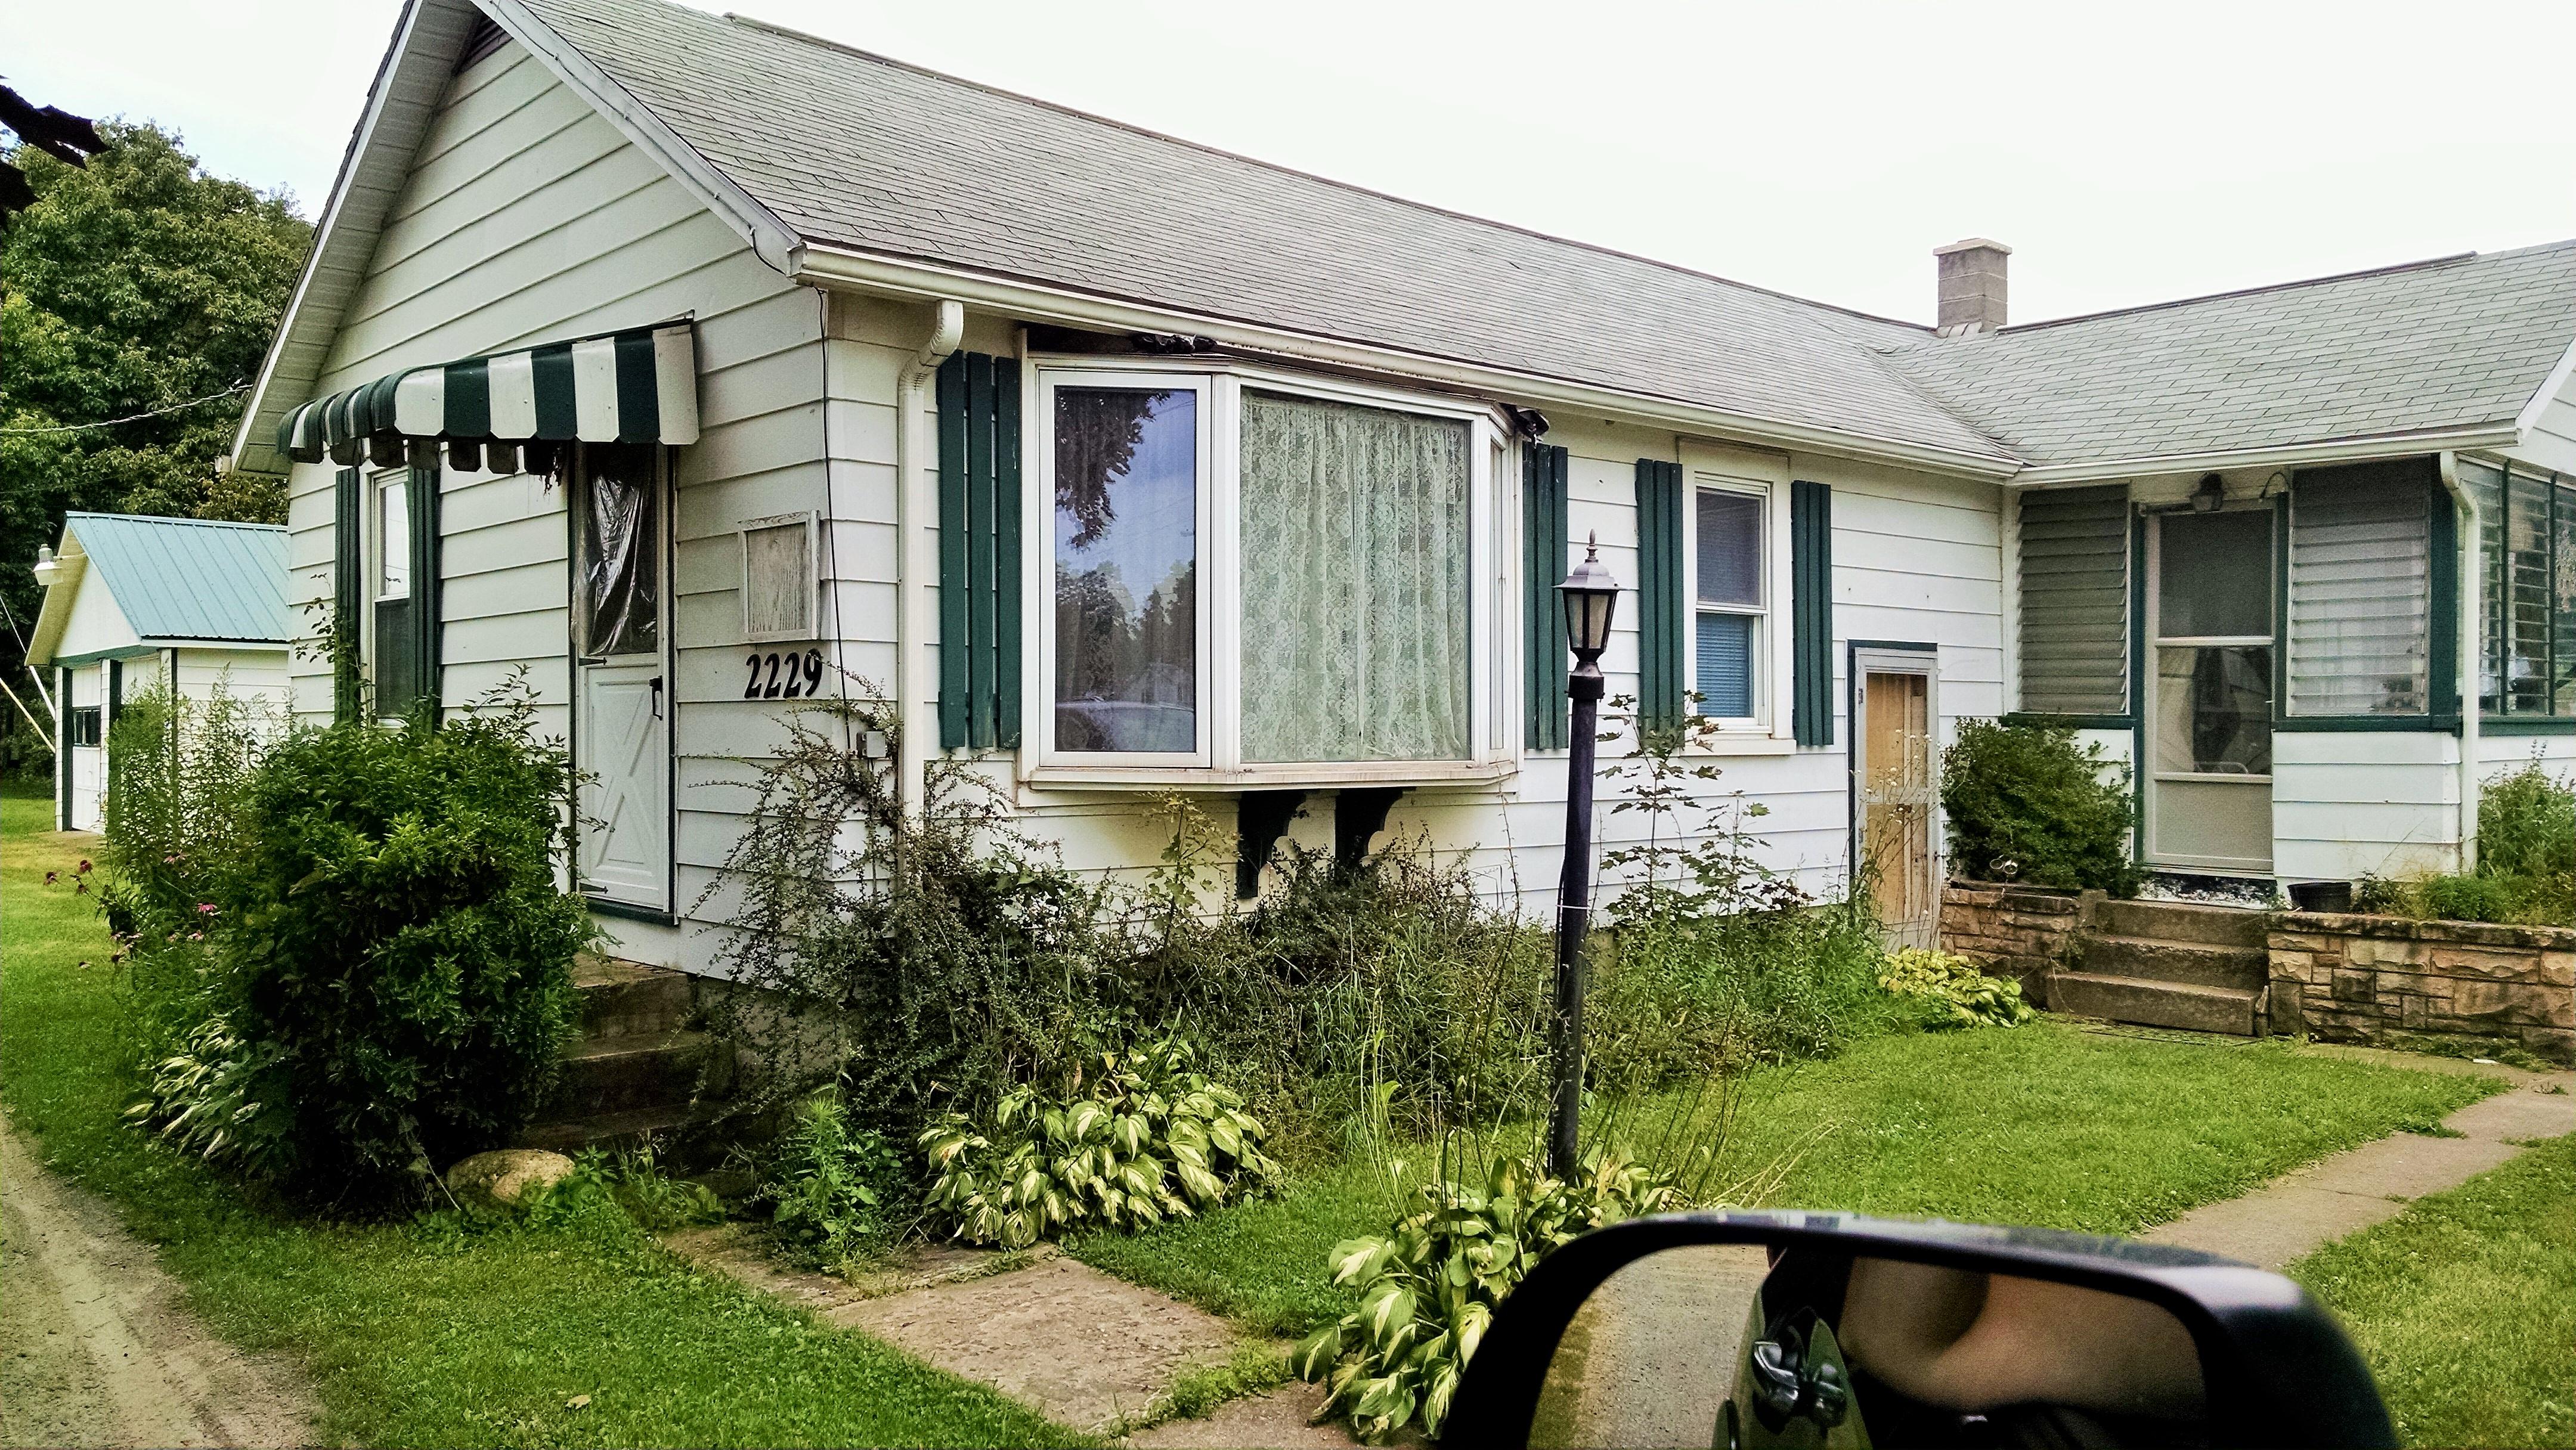 2229 Rt 442 Highway, Muncy, Pennsylvania 17756